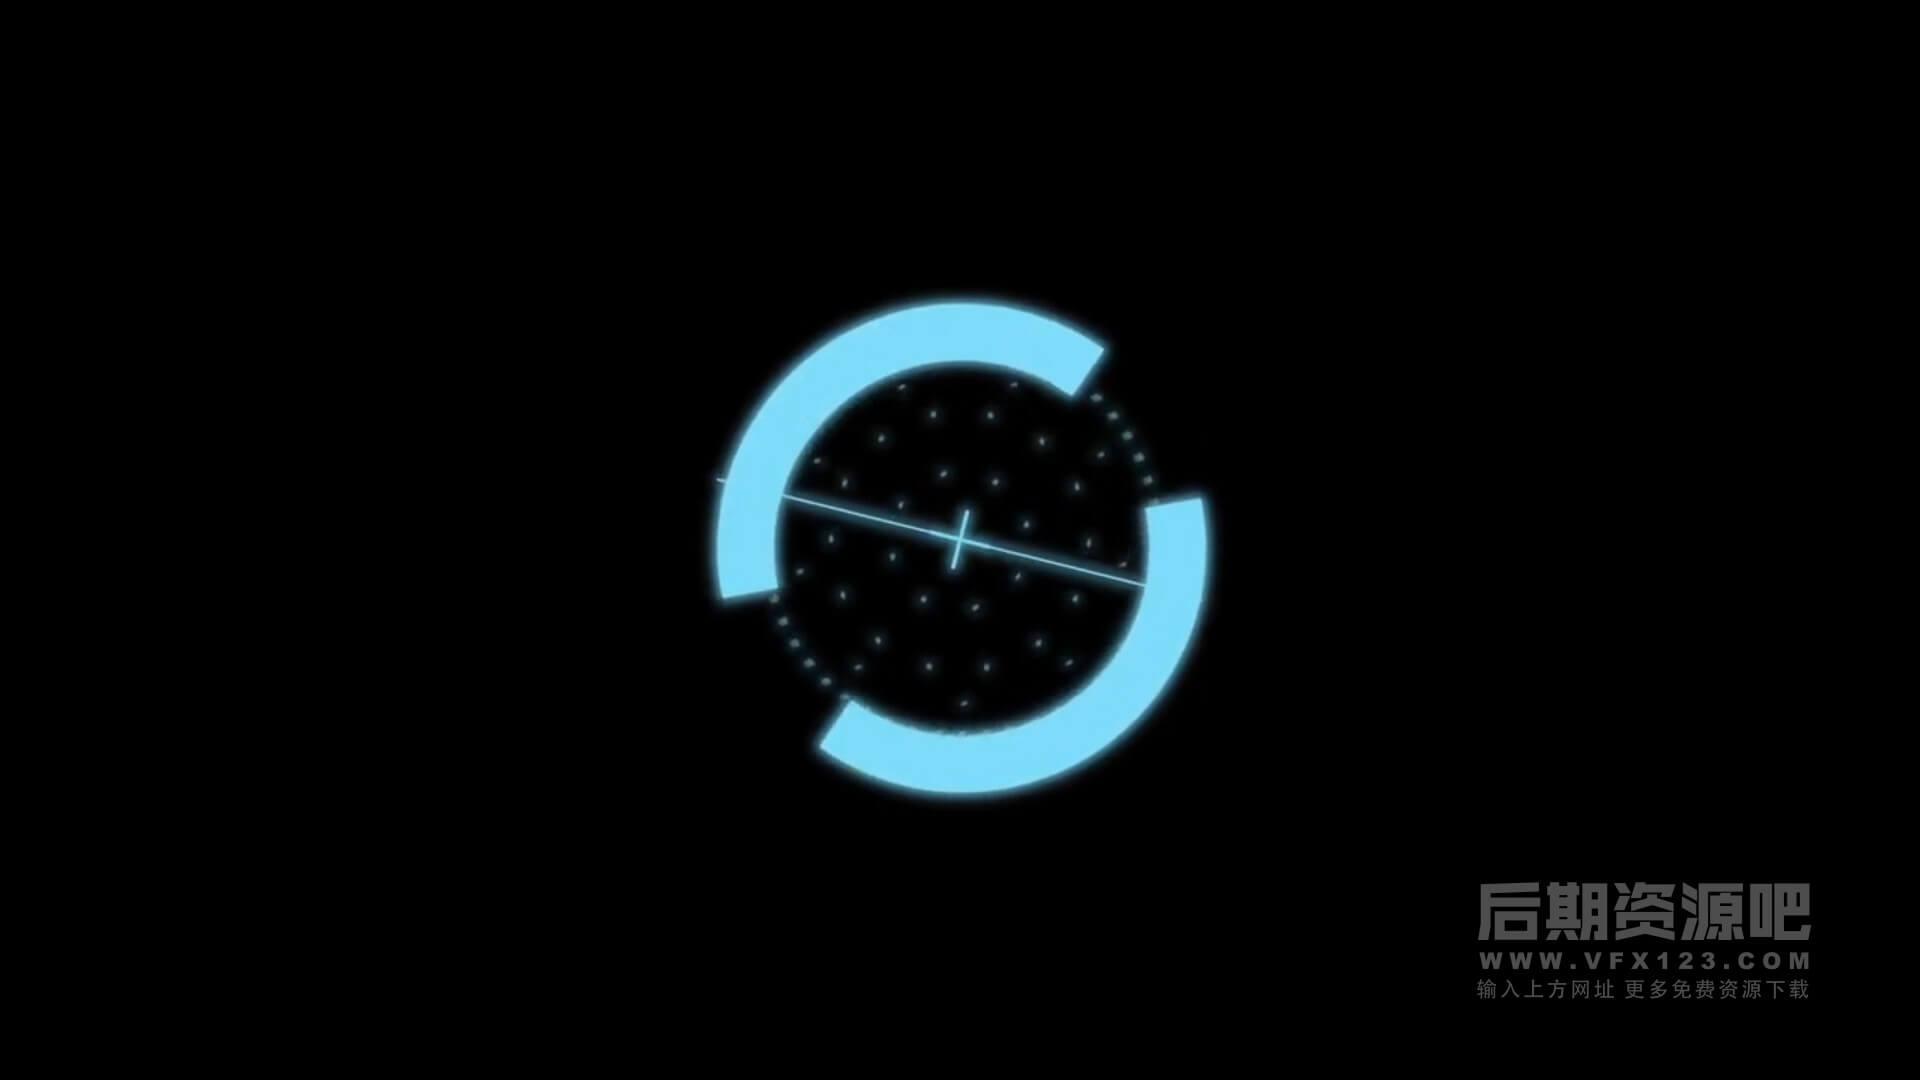 FCPX动画元素 科幻未来HUD界面动态元素 HUD Elements